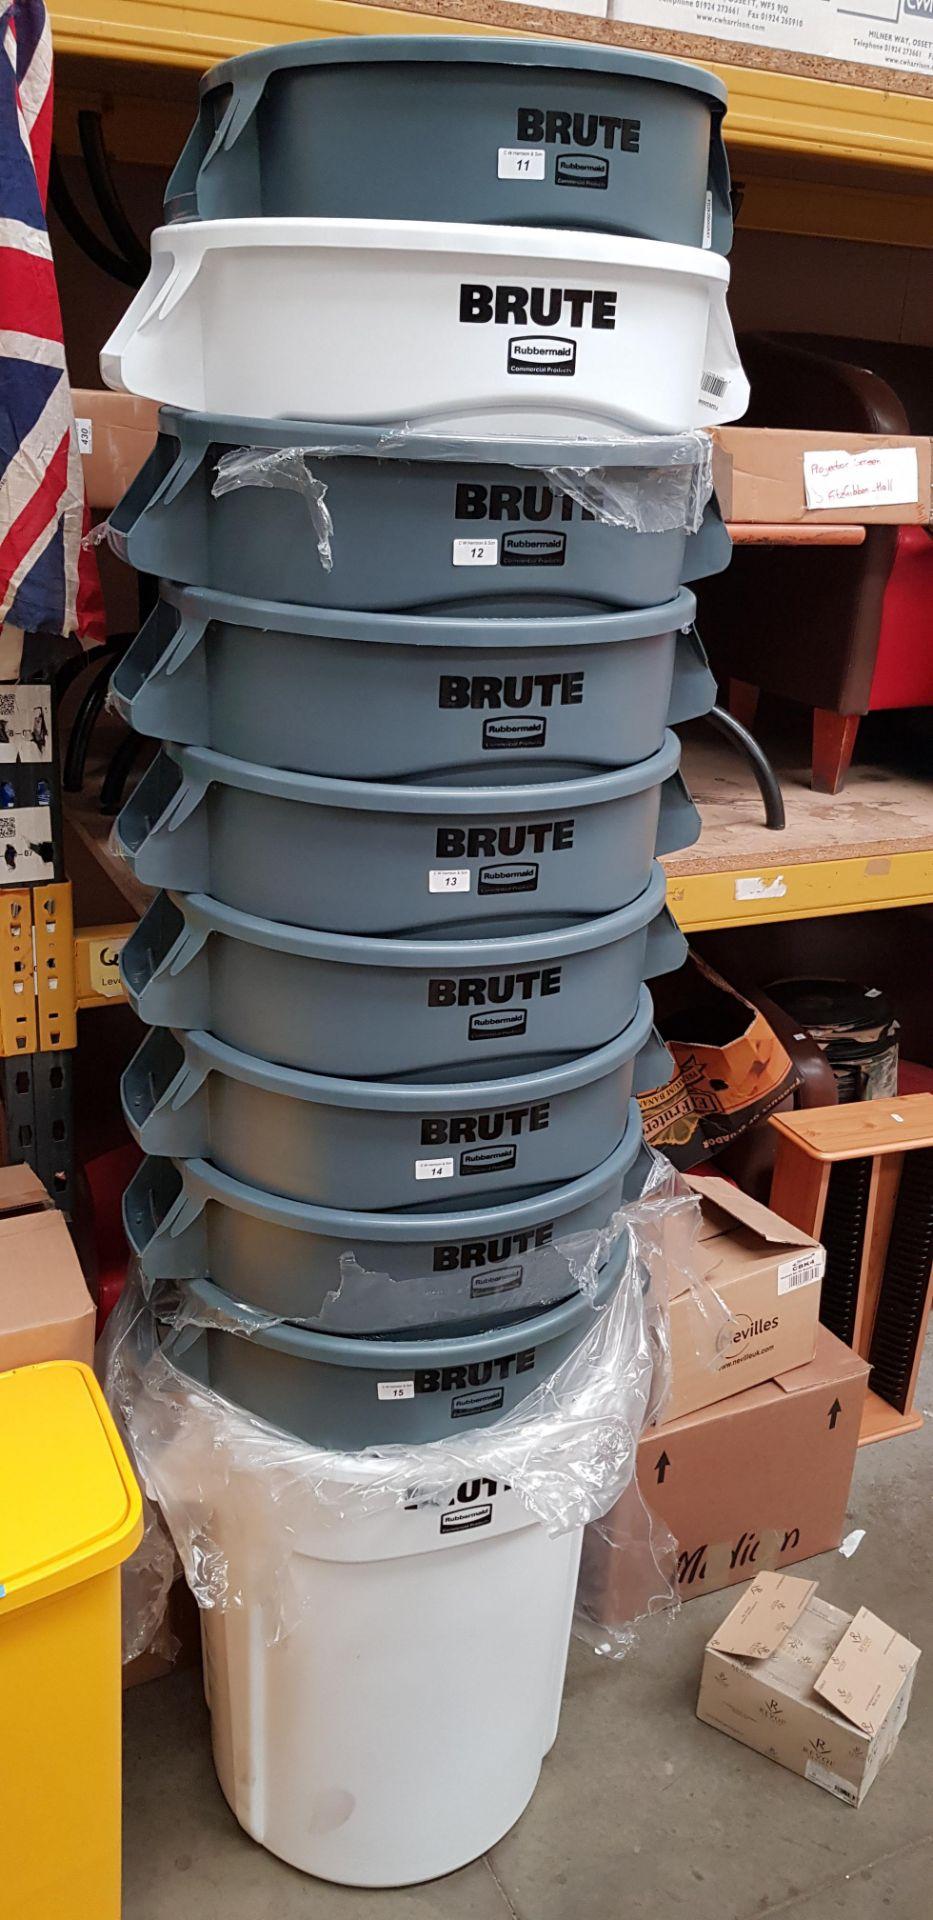 Lot 11 - 2 X RUBBERMAID BRUTE BINS: 75.7L FG262000GREY & 121.1L, FG263200WHT COMMERCIAL BINS.